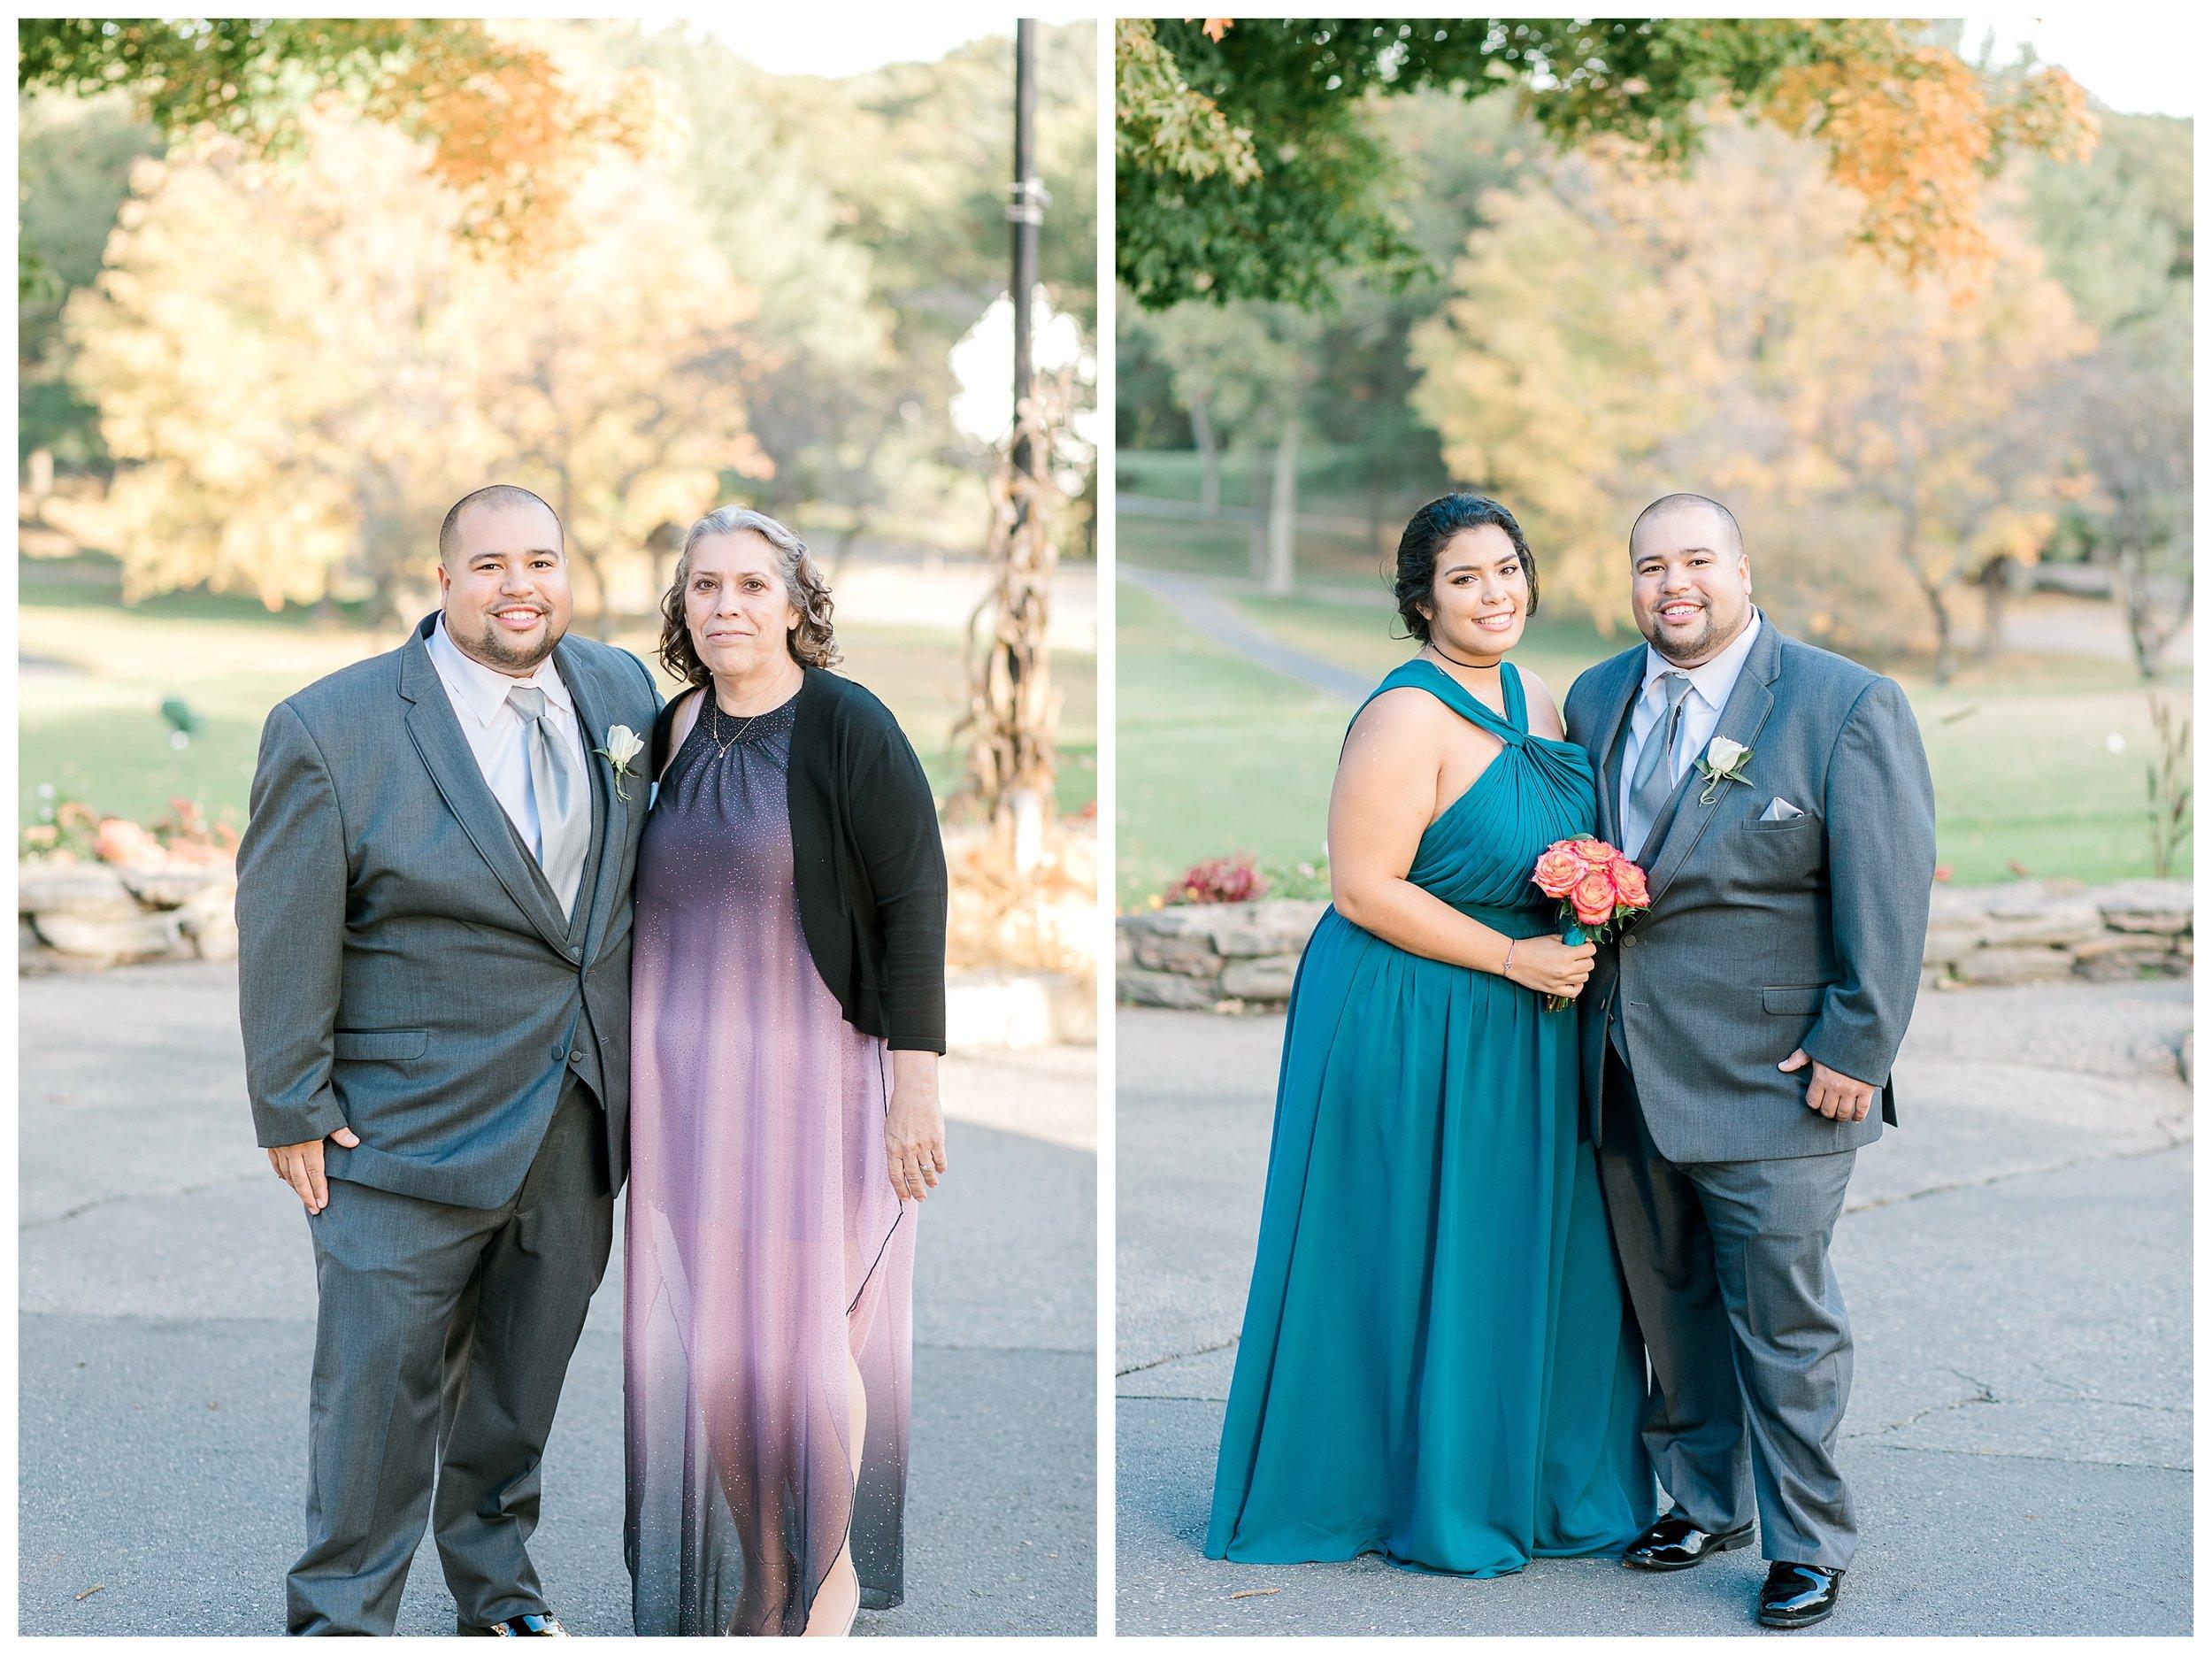 pleasant_valley_country_club_wedding_sutton_erica_pezente_photography (43).jpg